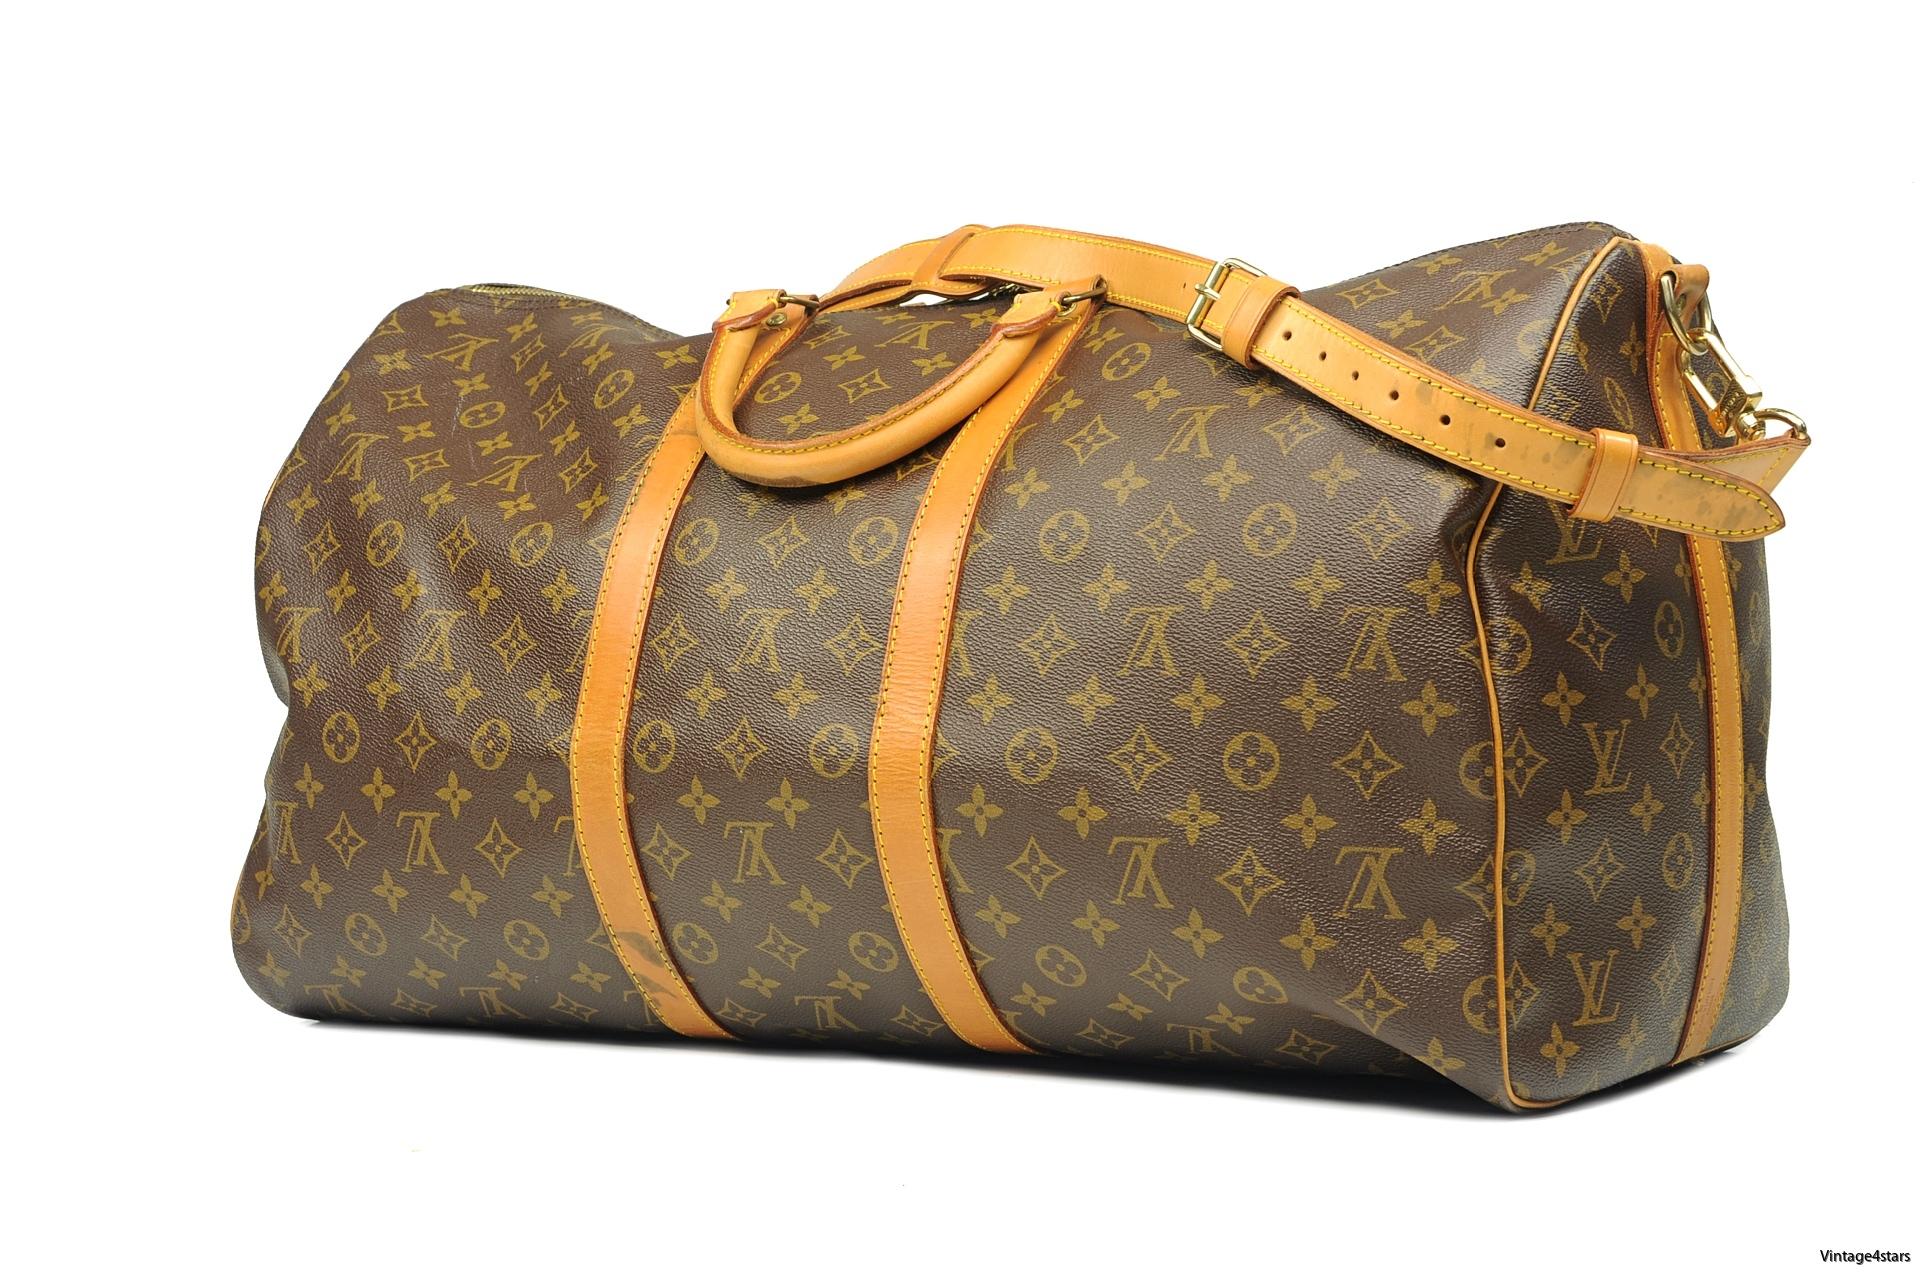 Louis Vuitton Keepall 55 Band 2a-2